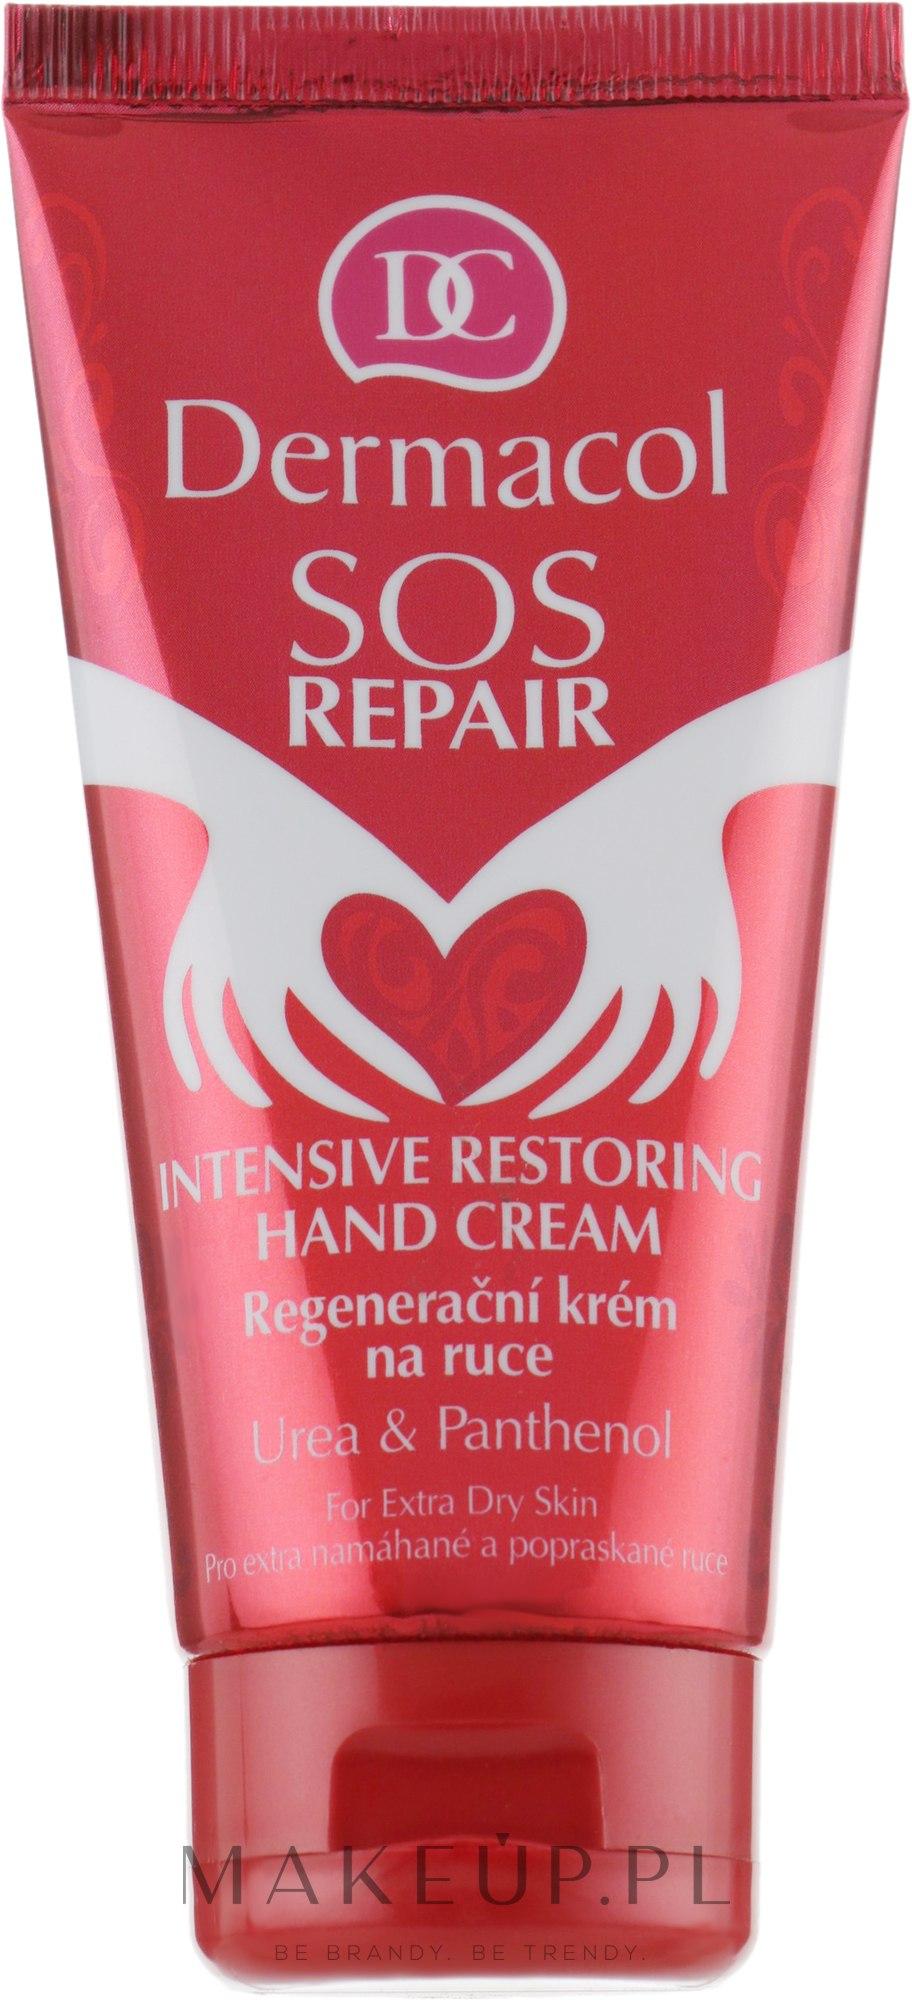 Intensywne regenerujący krem do rąk - Dermacol SOS Repair Hand Cream — фото 75 ml